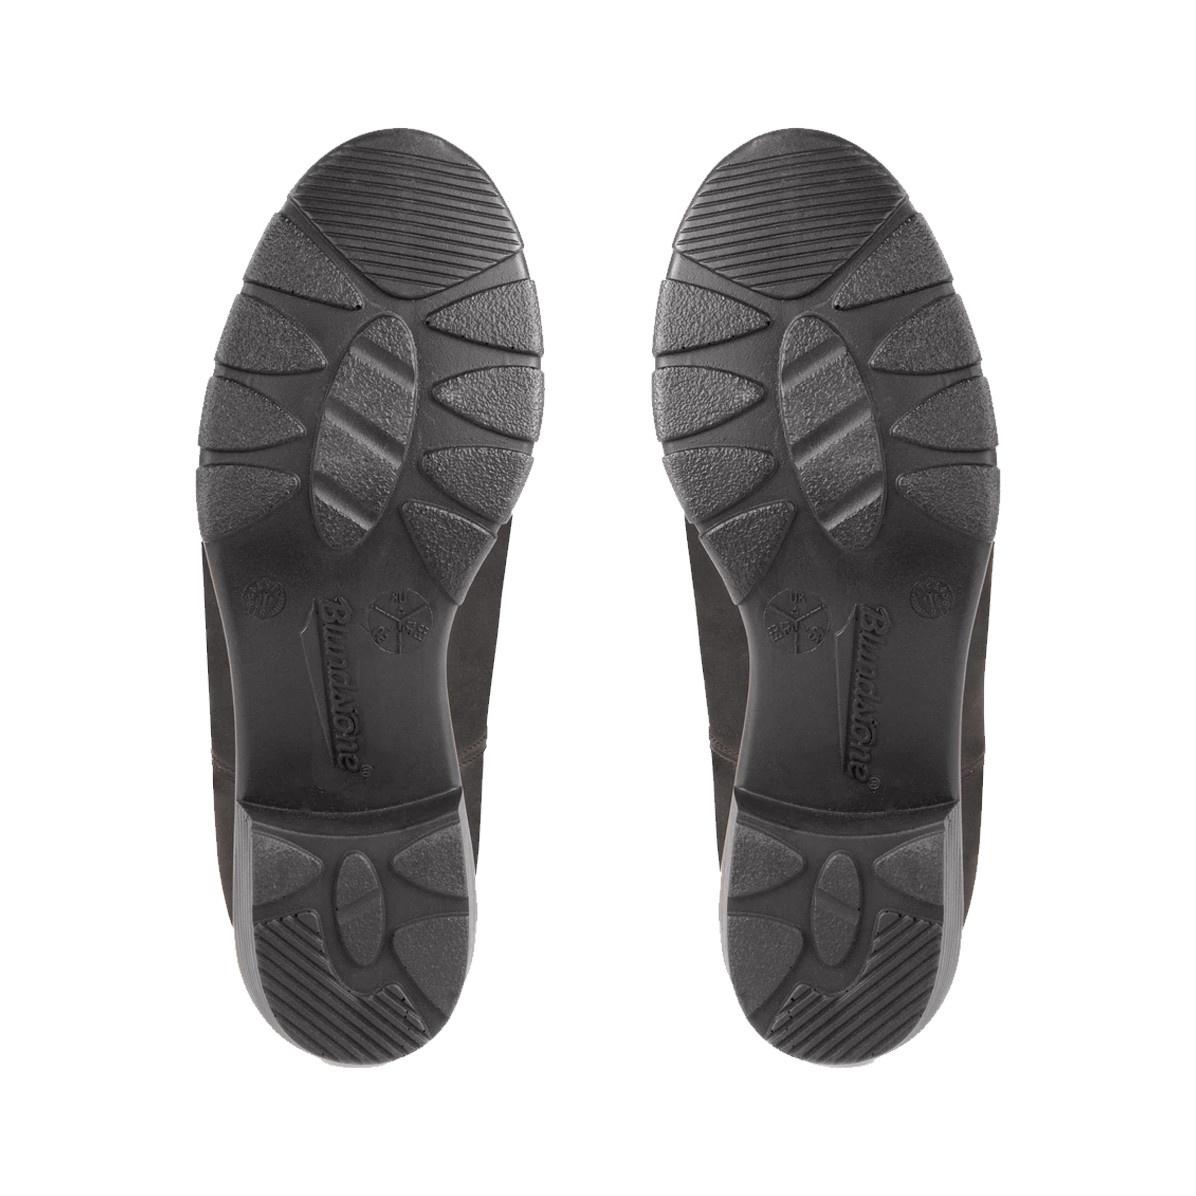 Blundstone Blundstone 1960 Women's Heel Black Nubuck